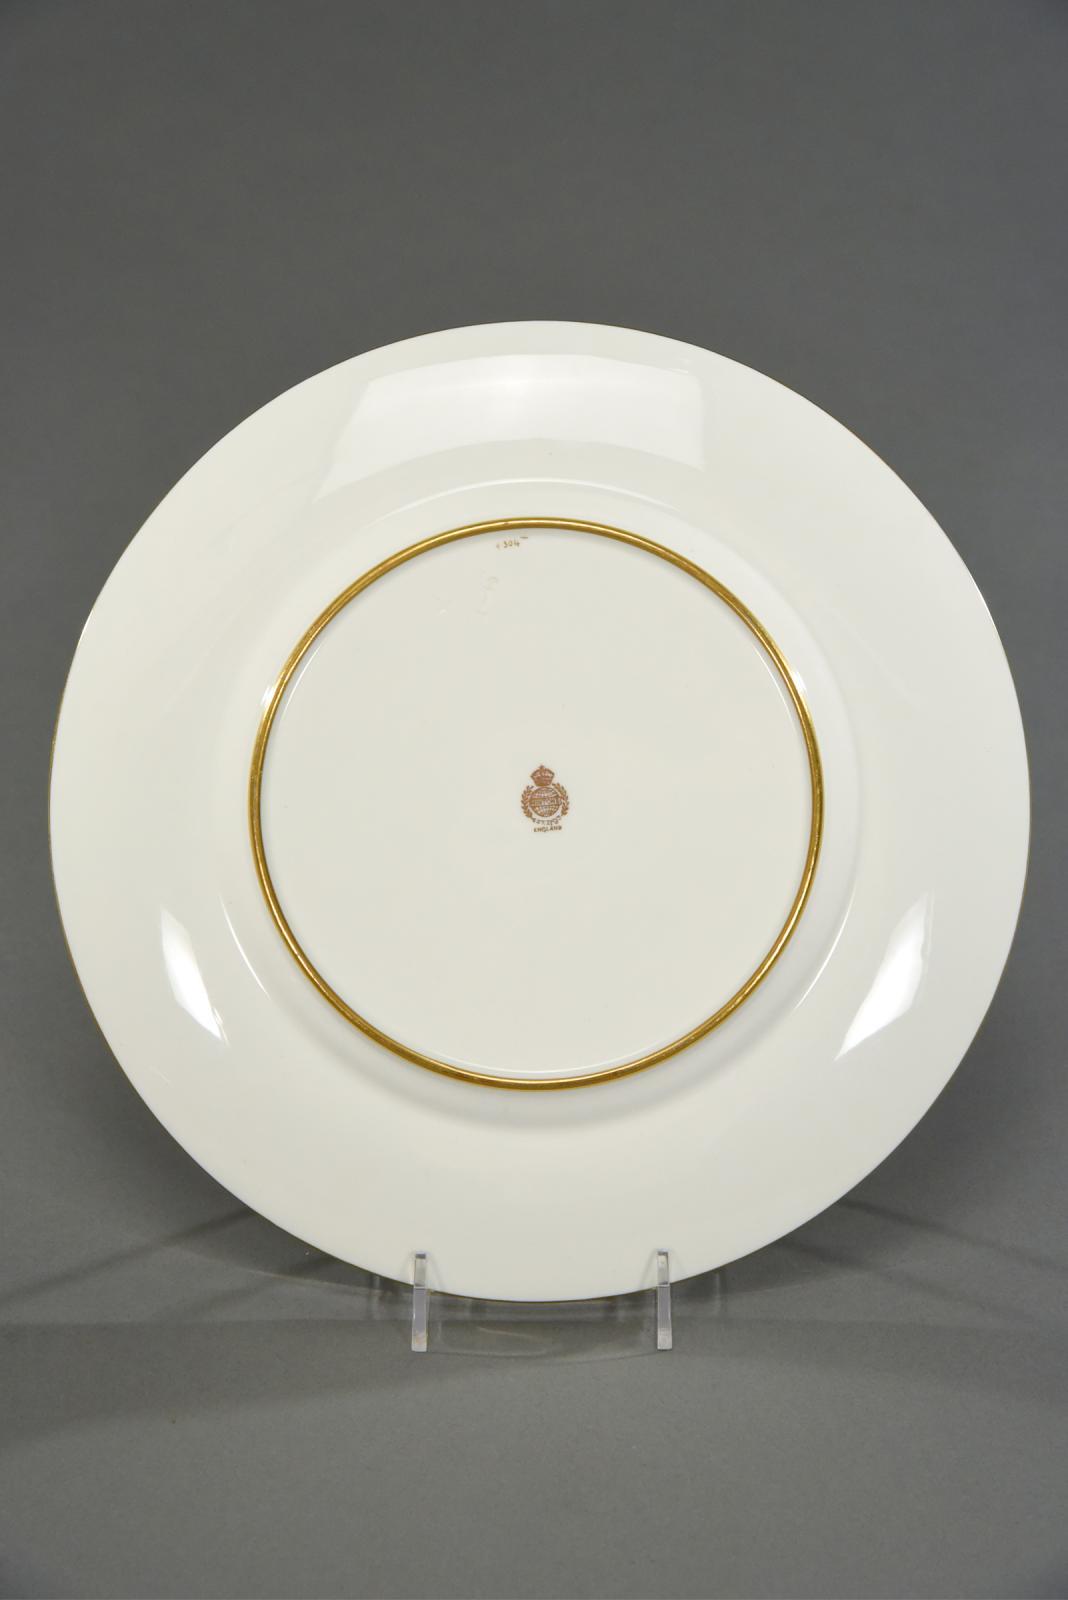 Set of 11 Minton Cream \u0026 Raised Paste Gold Dinner Plates & Set of 11 Minton Cream \u0026 Raised Paste Gold Dinner Plates | Dinner ...